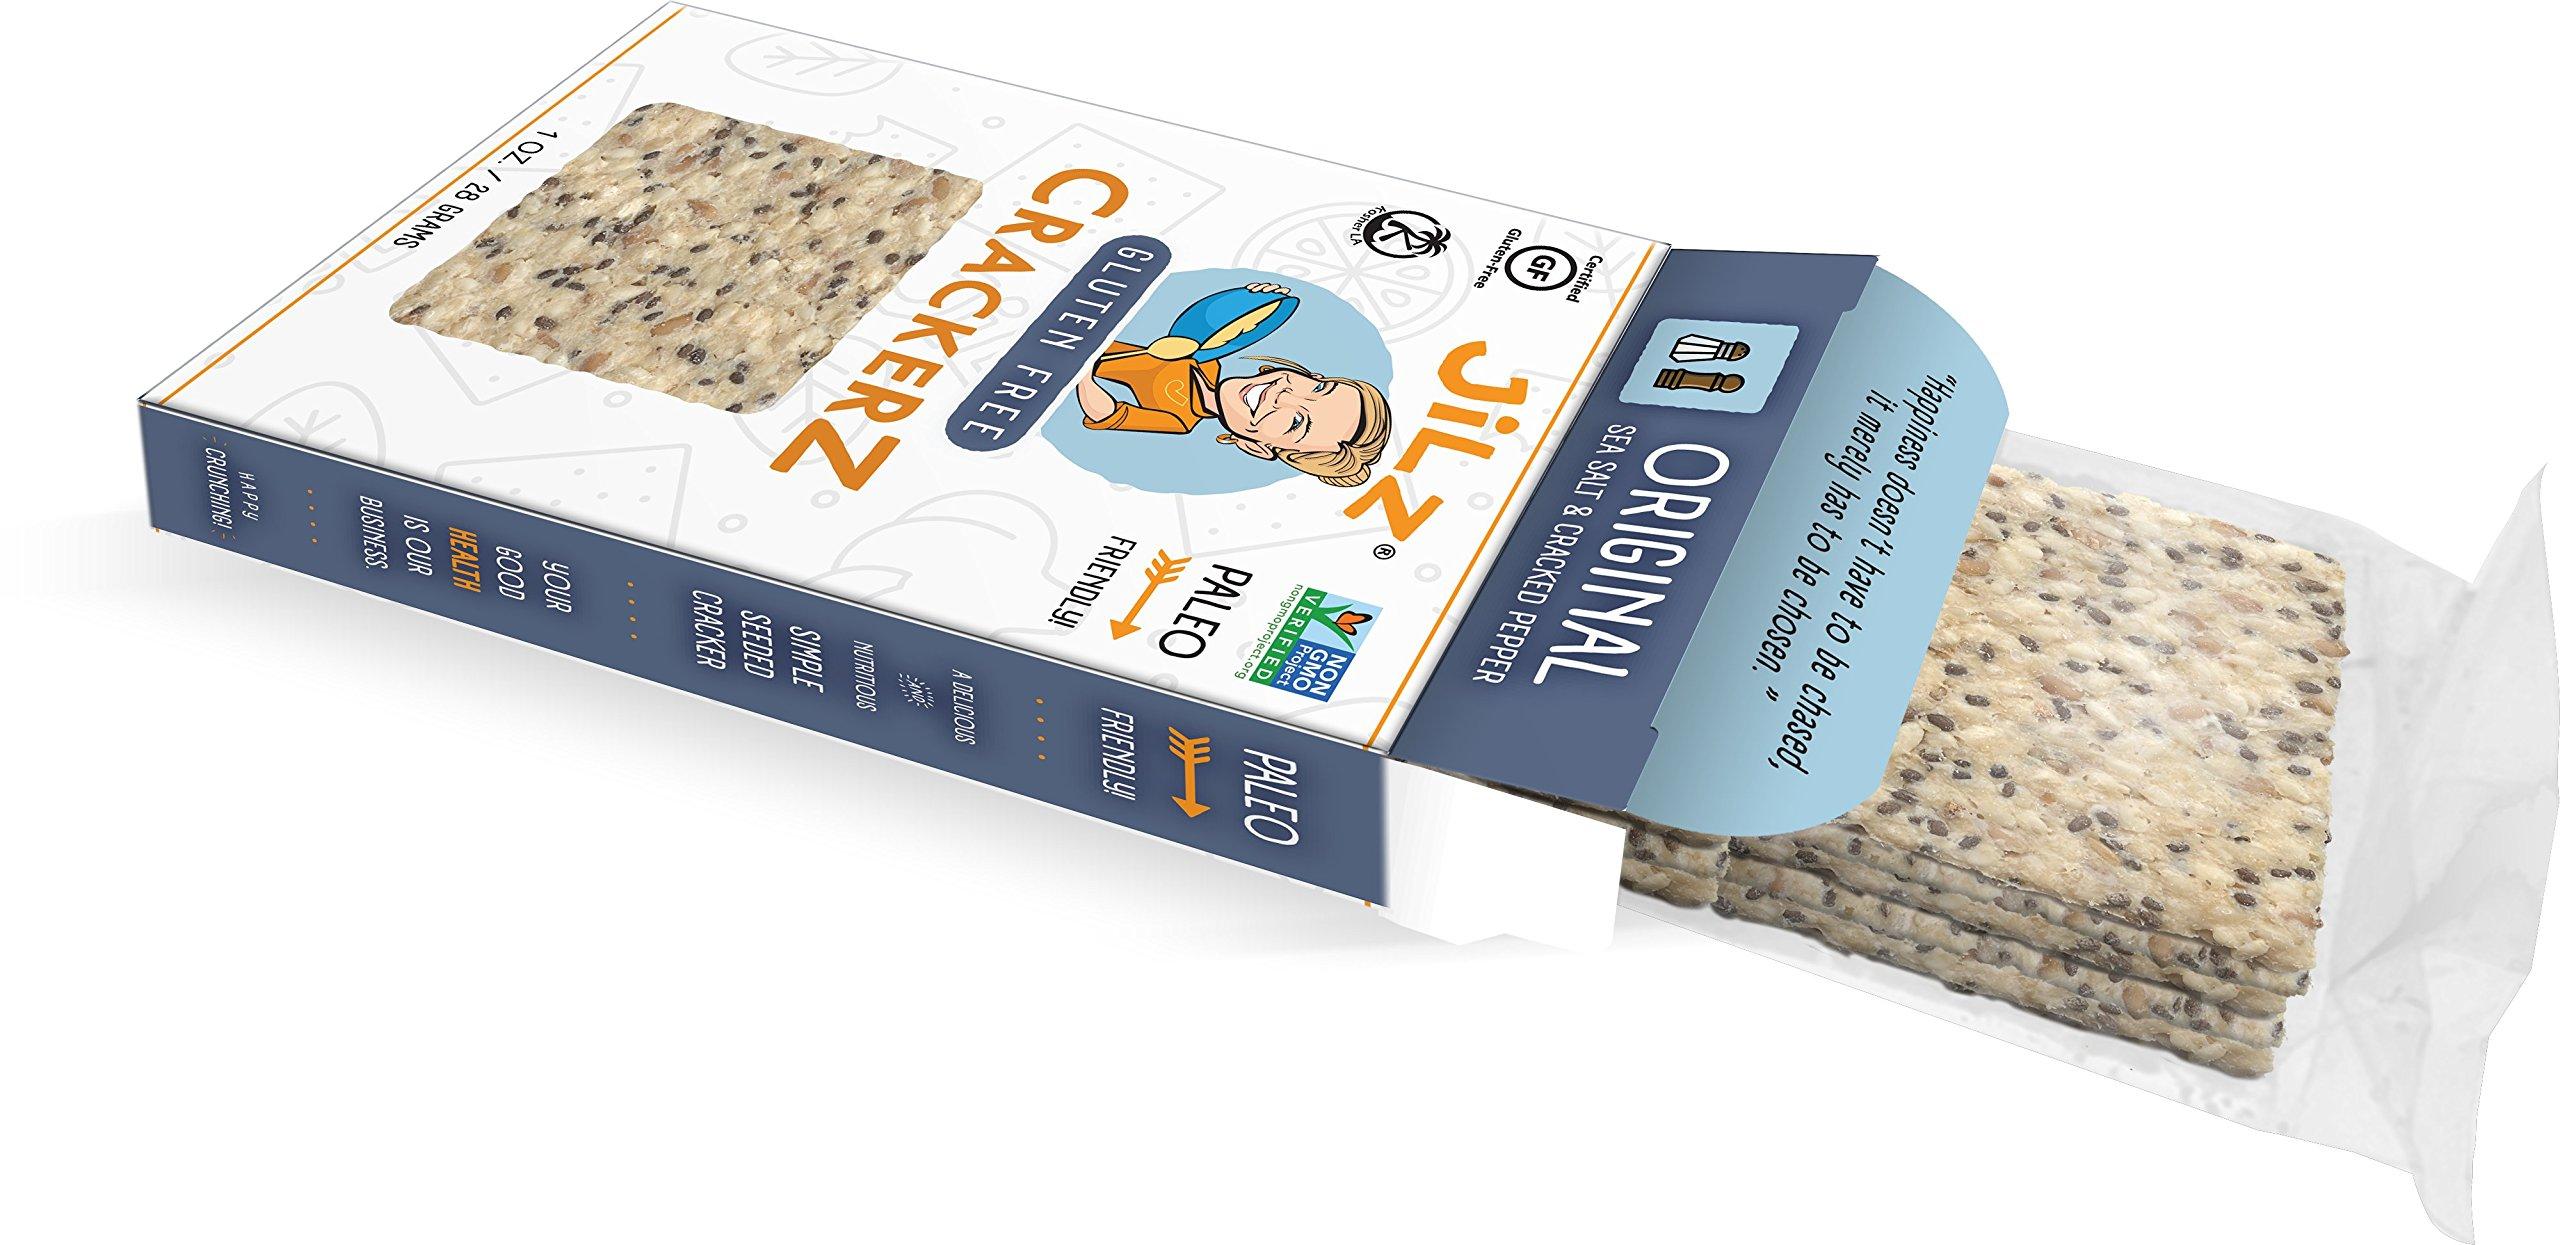 Jilz Gluten Free Grab and Go Single Serve 10 Pack - Cracked Pepper and Sea Salt